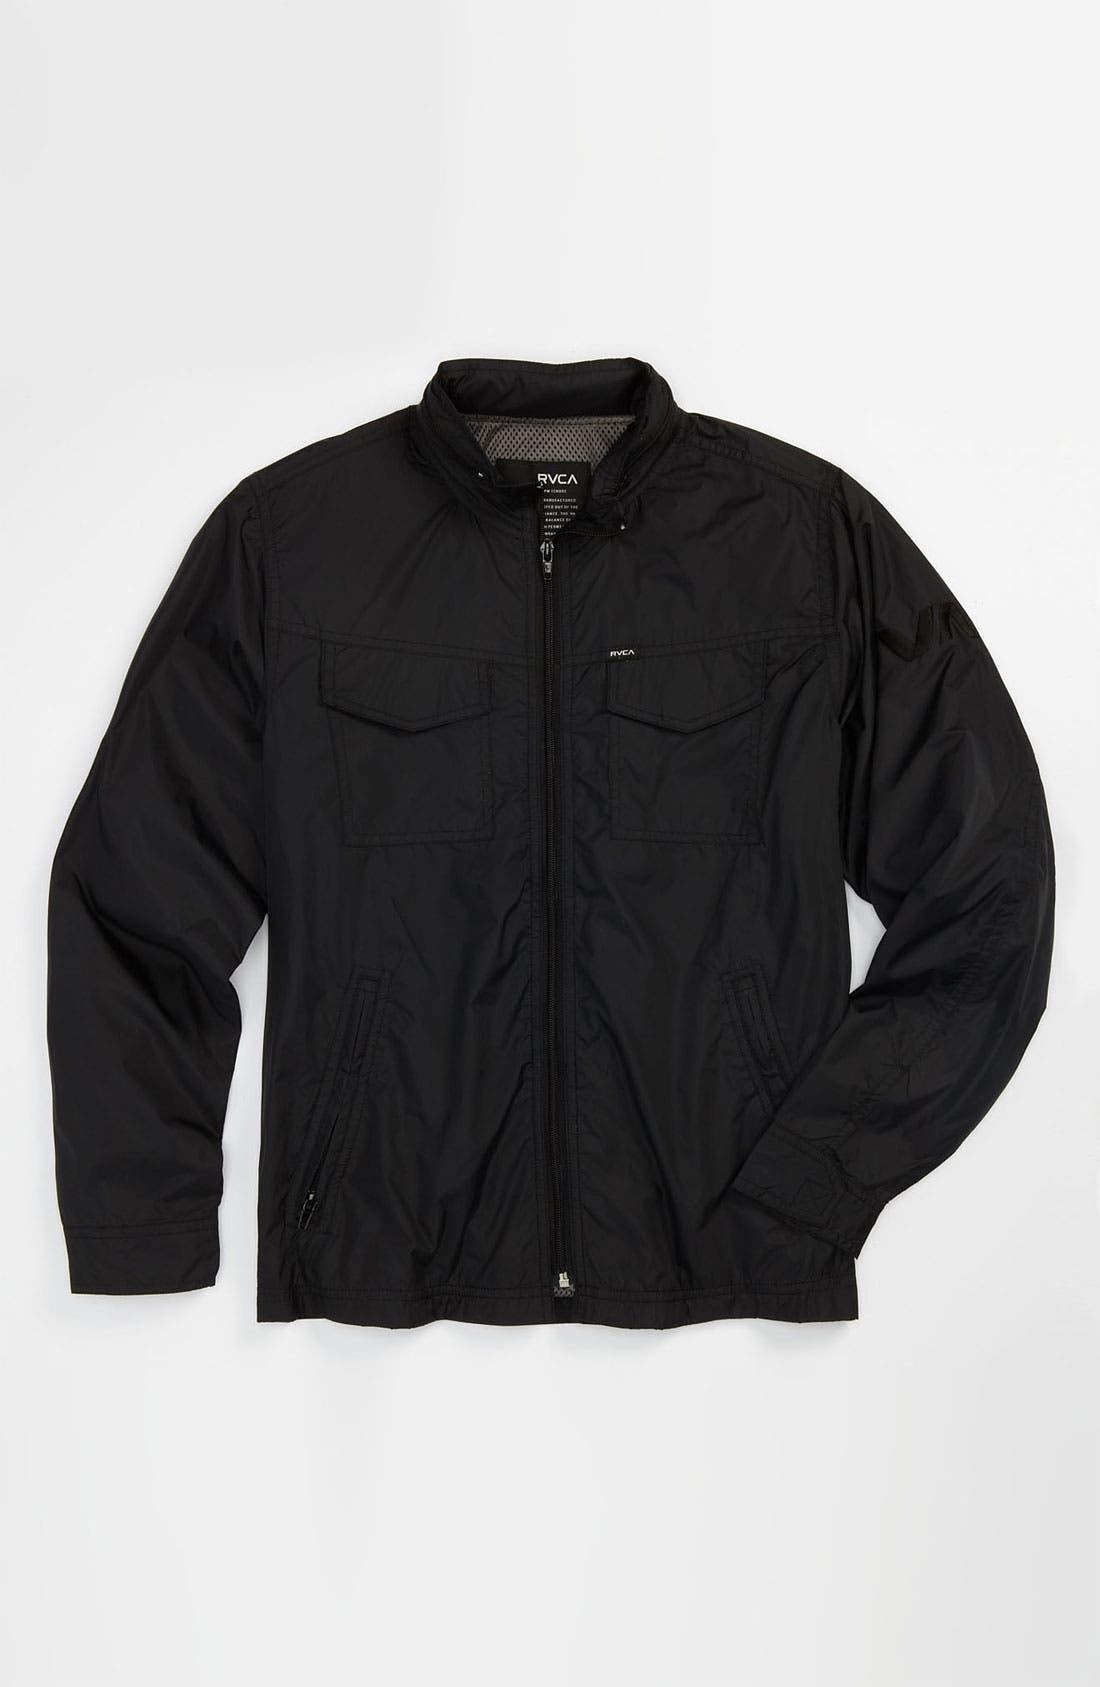 Alternate Image 1 Selected - RVCA 'Bay Breaker' Jacket (Big Boys)